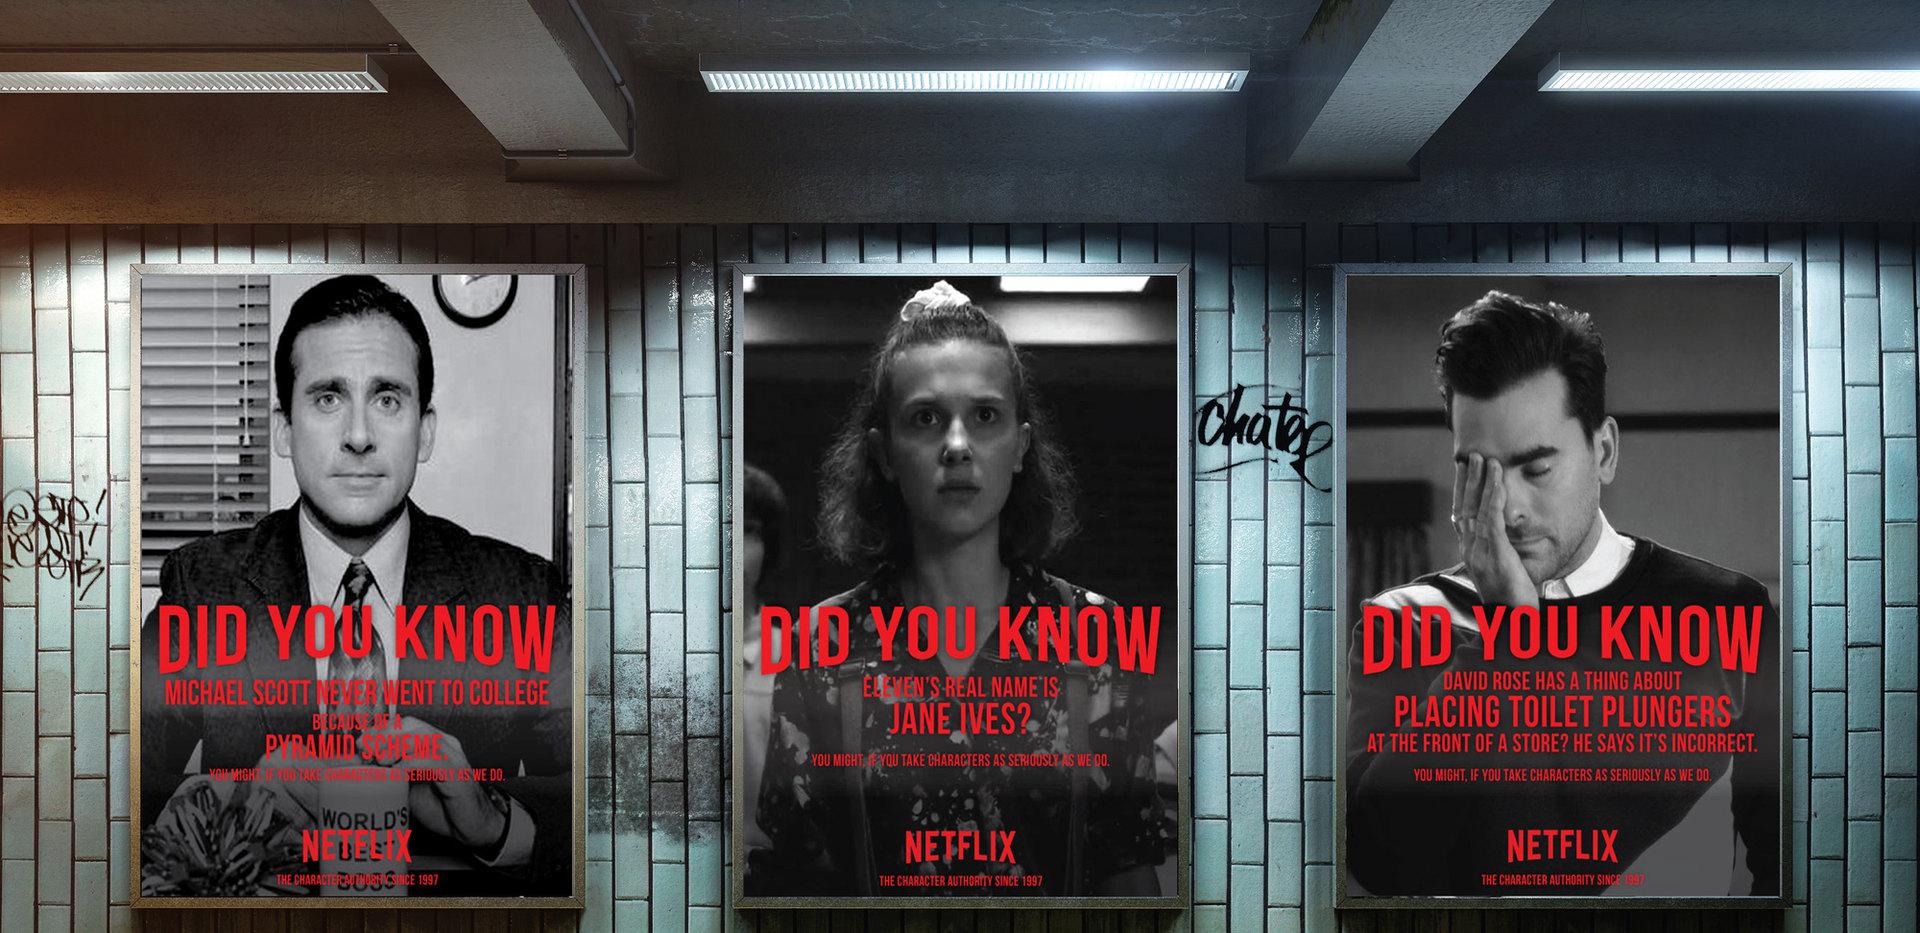 NetflixInSitu.jpg